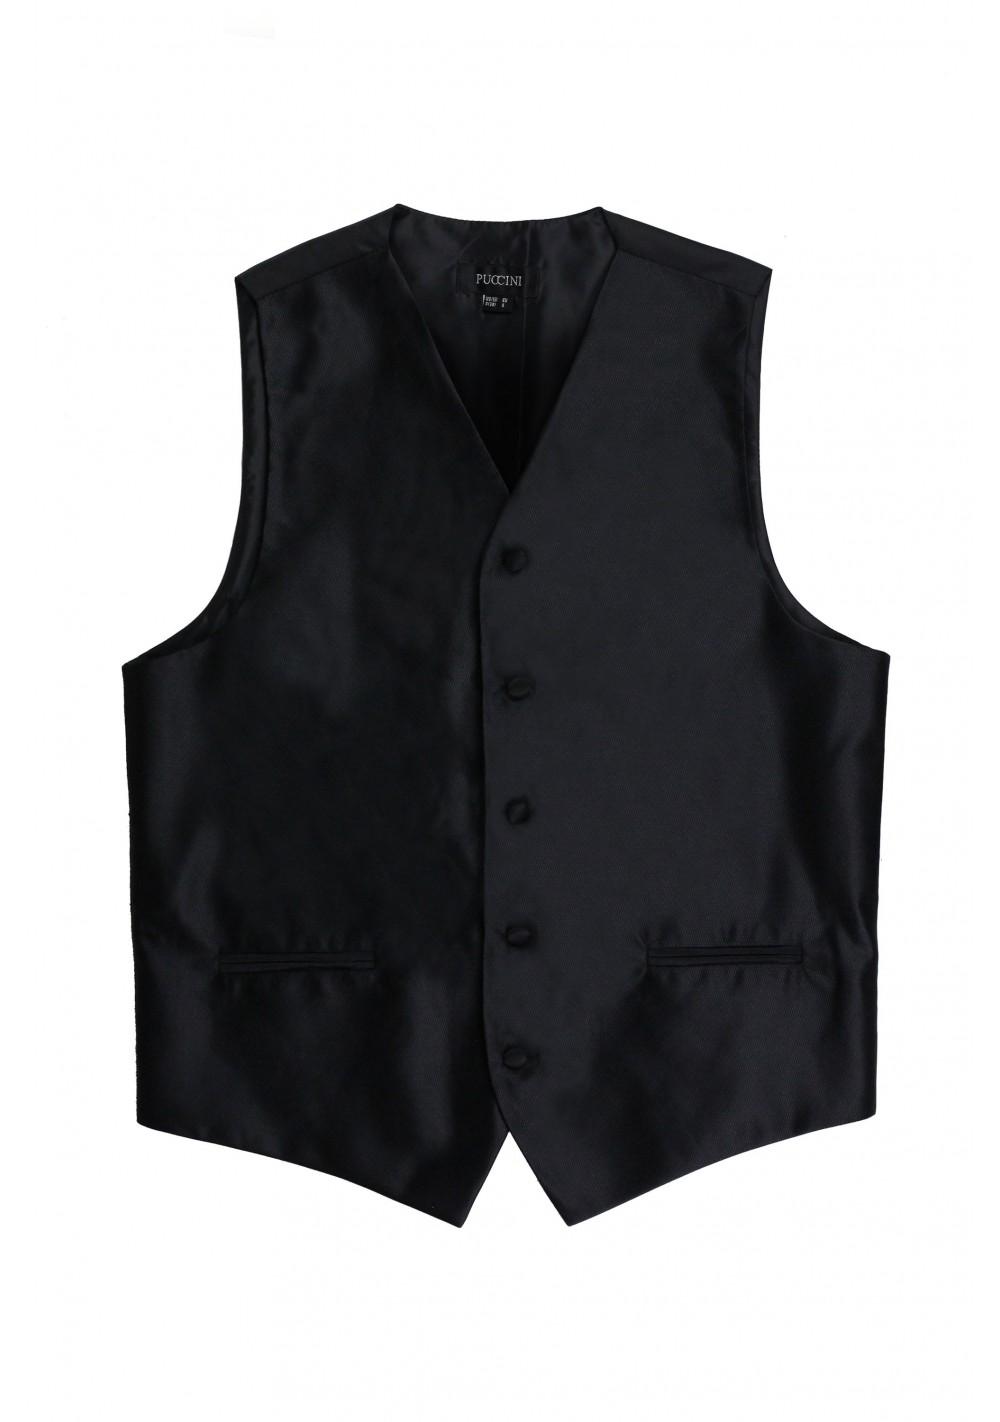 formal black tuxedo wedding prom vest